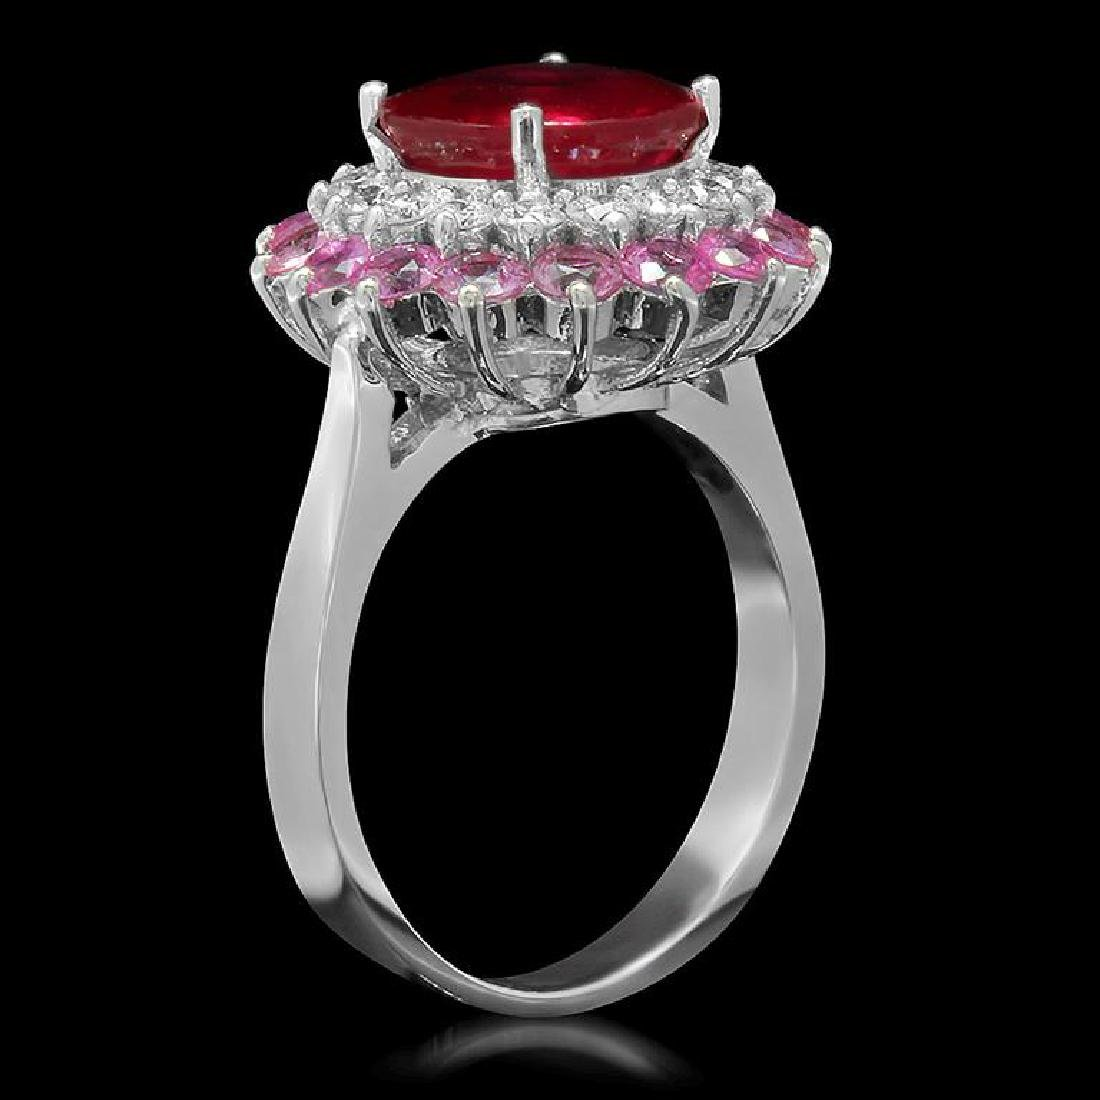 14K 2.78ct Ruby, 2.08ct Pink Sapphire, 0.61ct Diamond - 2